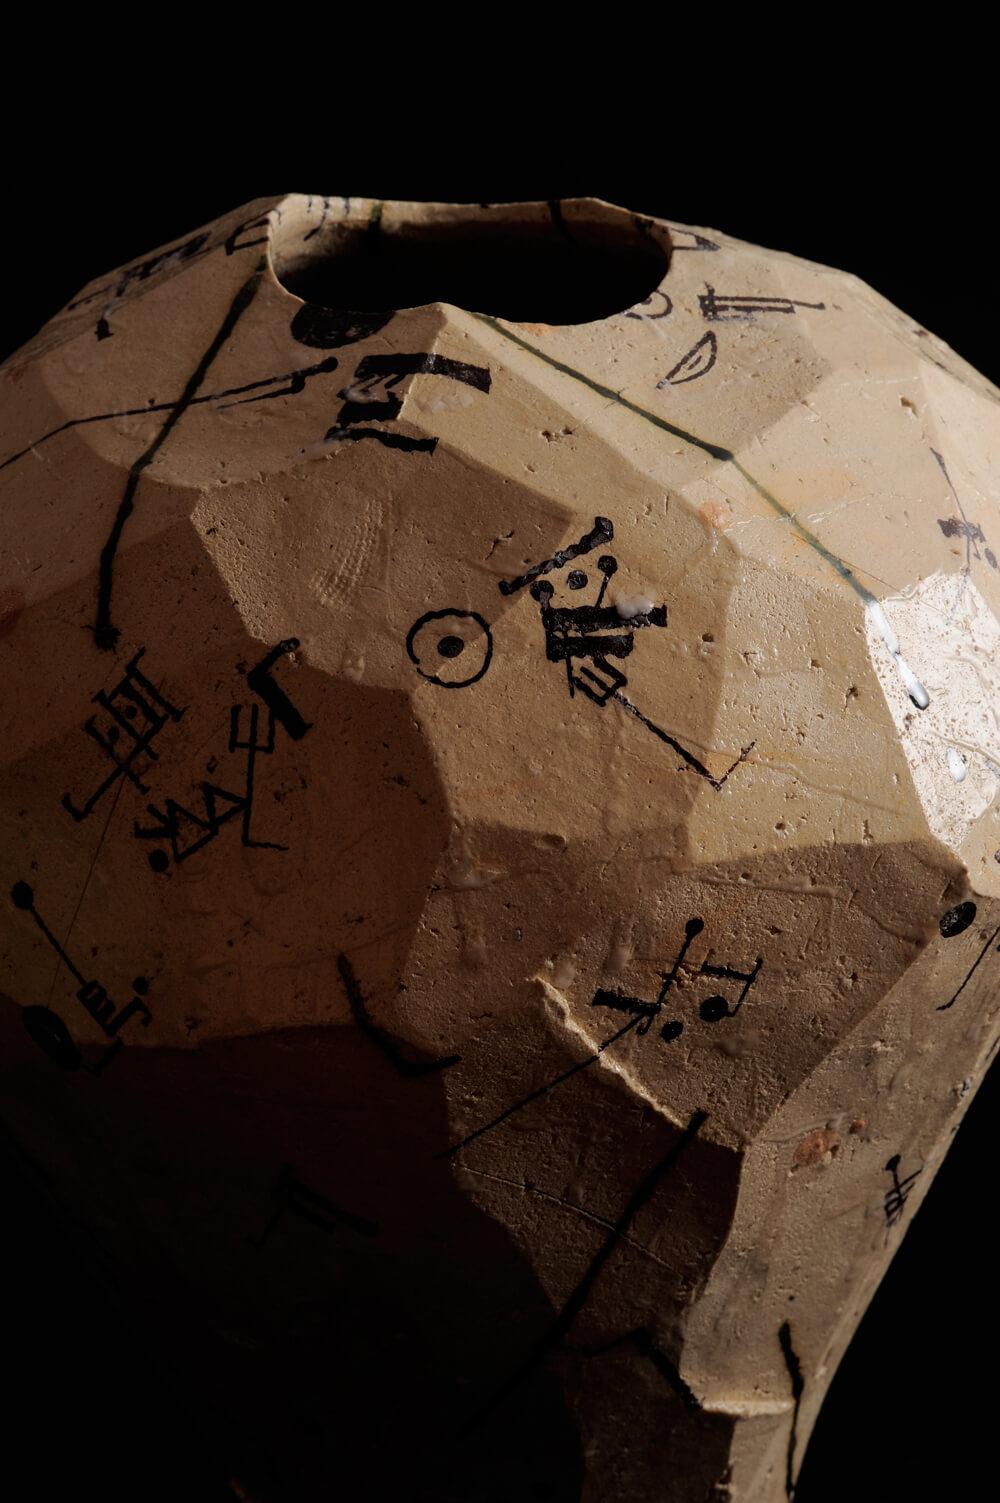 2011年6月25日から開催の「織部考 加藤 亮太郎 陶展」の加藤 亮太郎の作品画像5